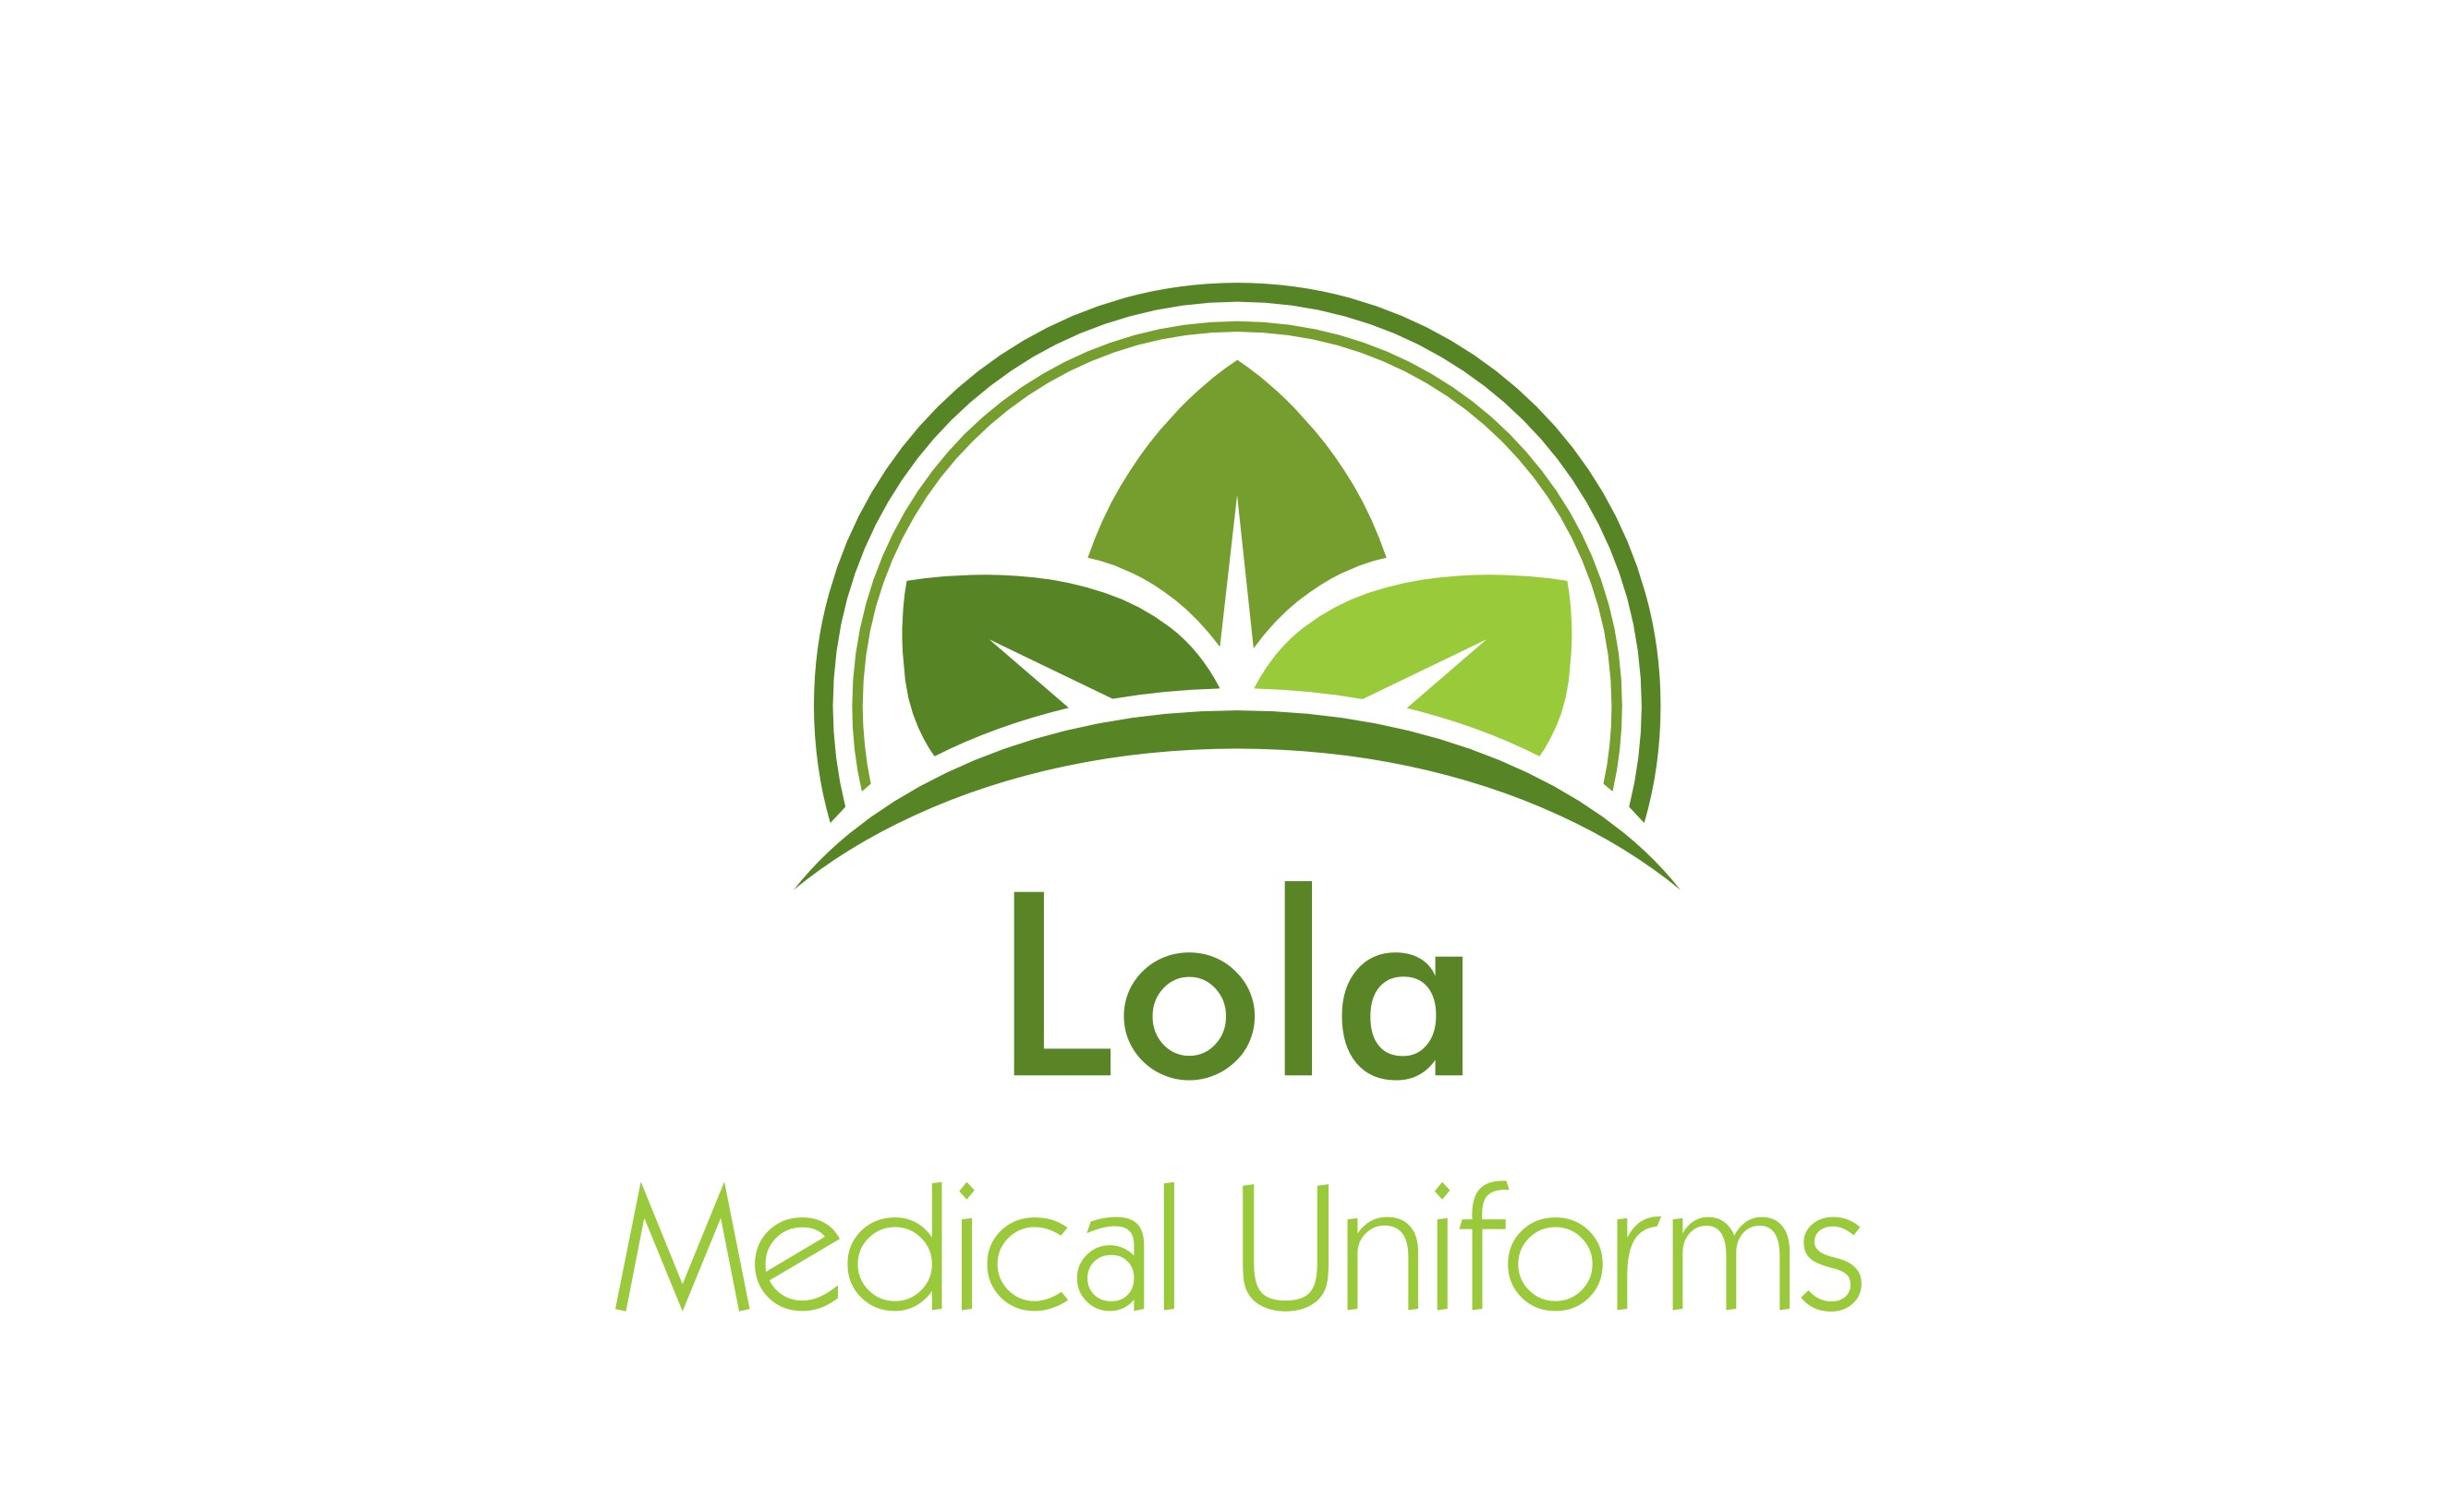 LolaMedicalUniforms